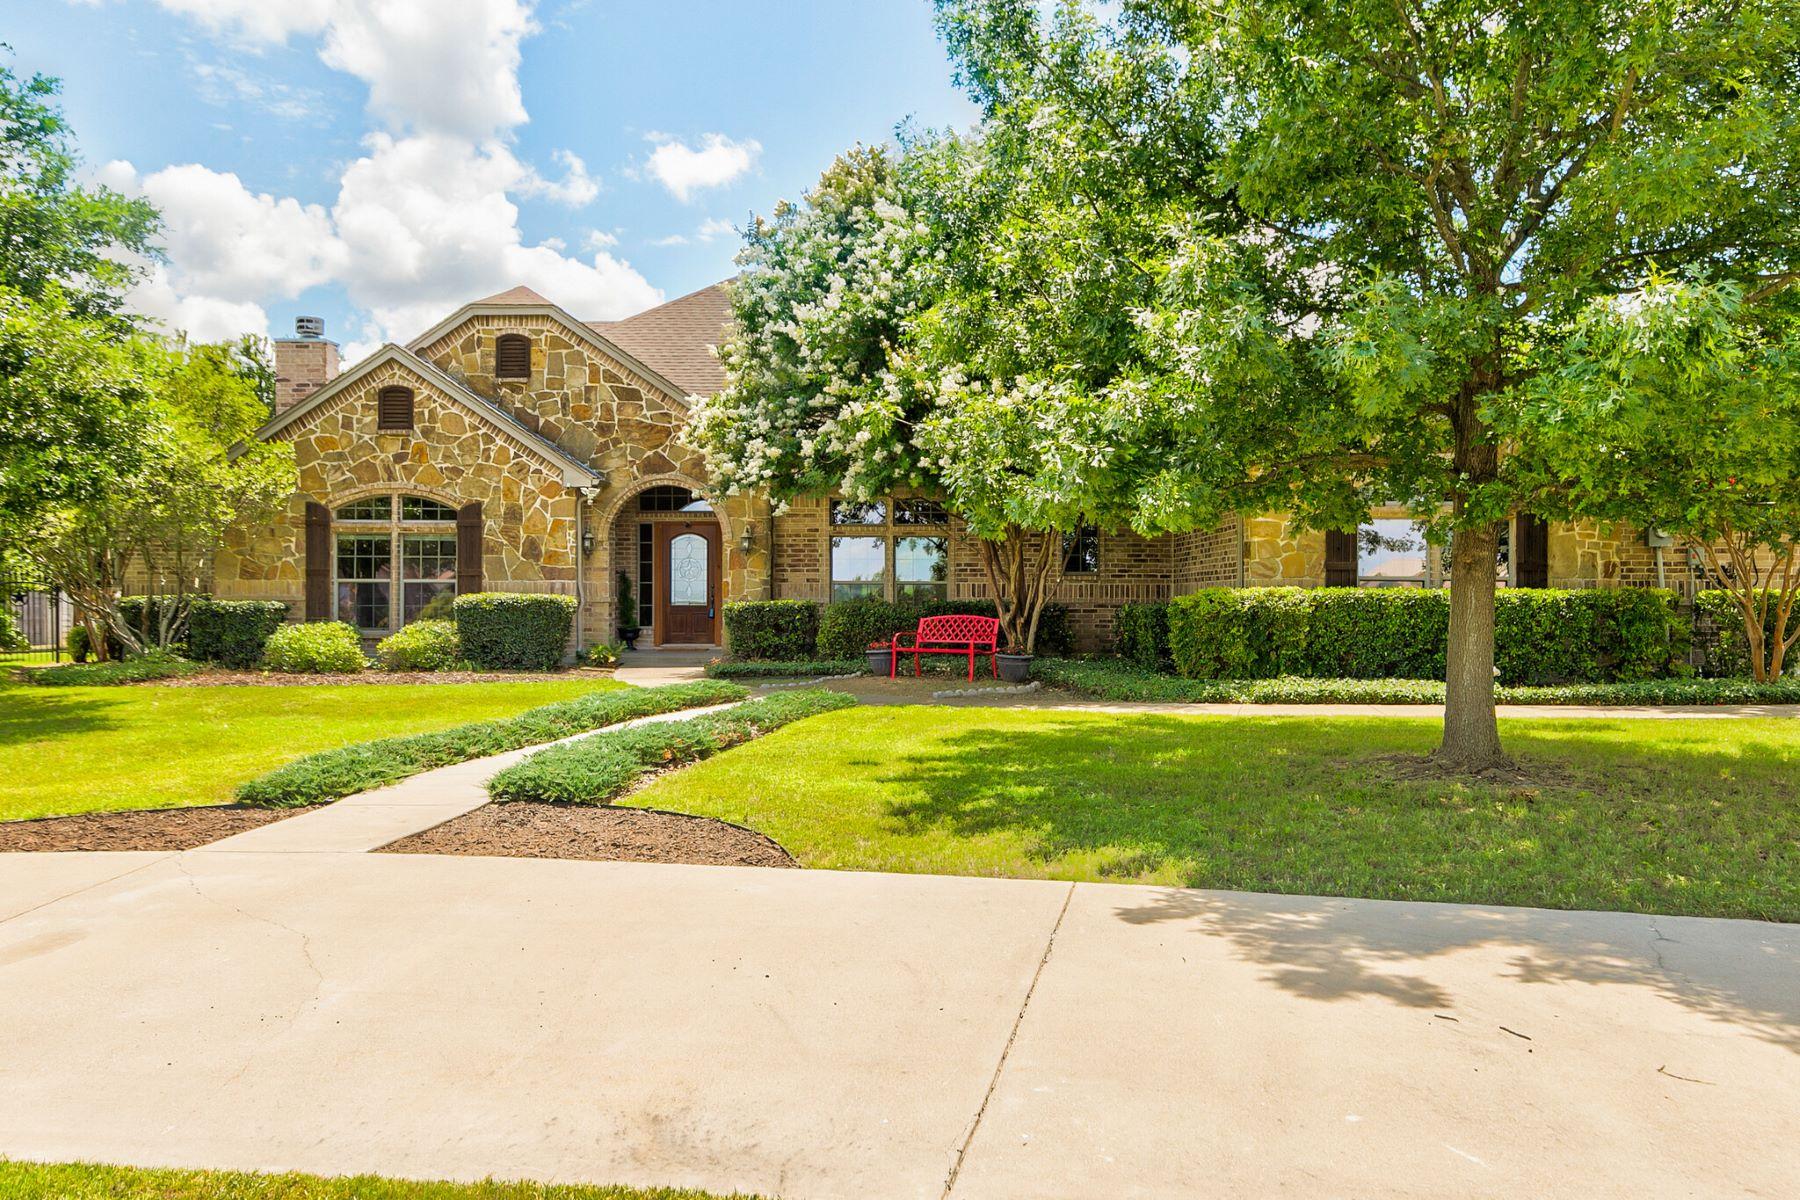 Single Family Homes for Sale at Gorgeous Home in Aledo ISD 119 Silver Ridge Lane Aledo, Texas 76008 United States